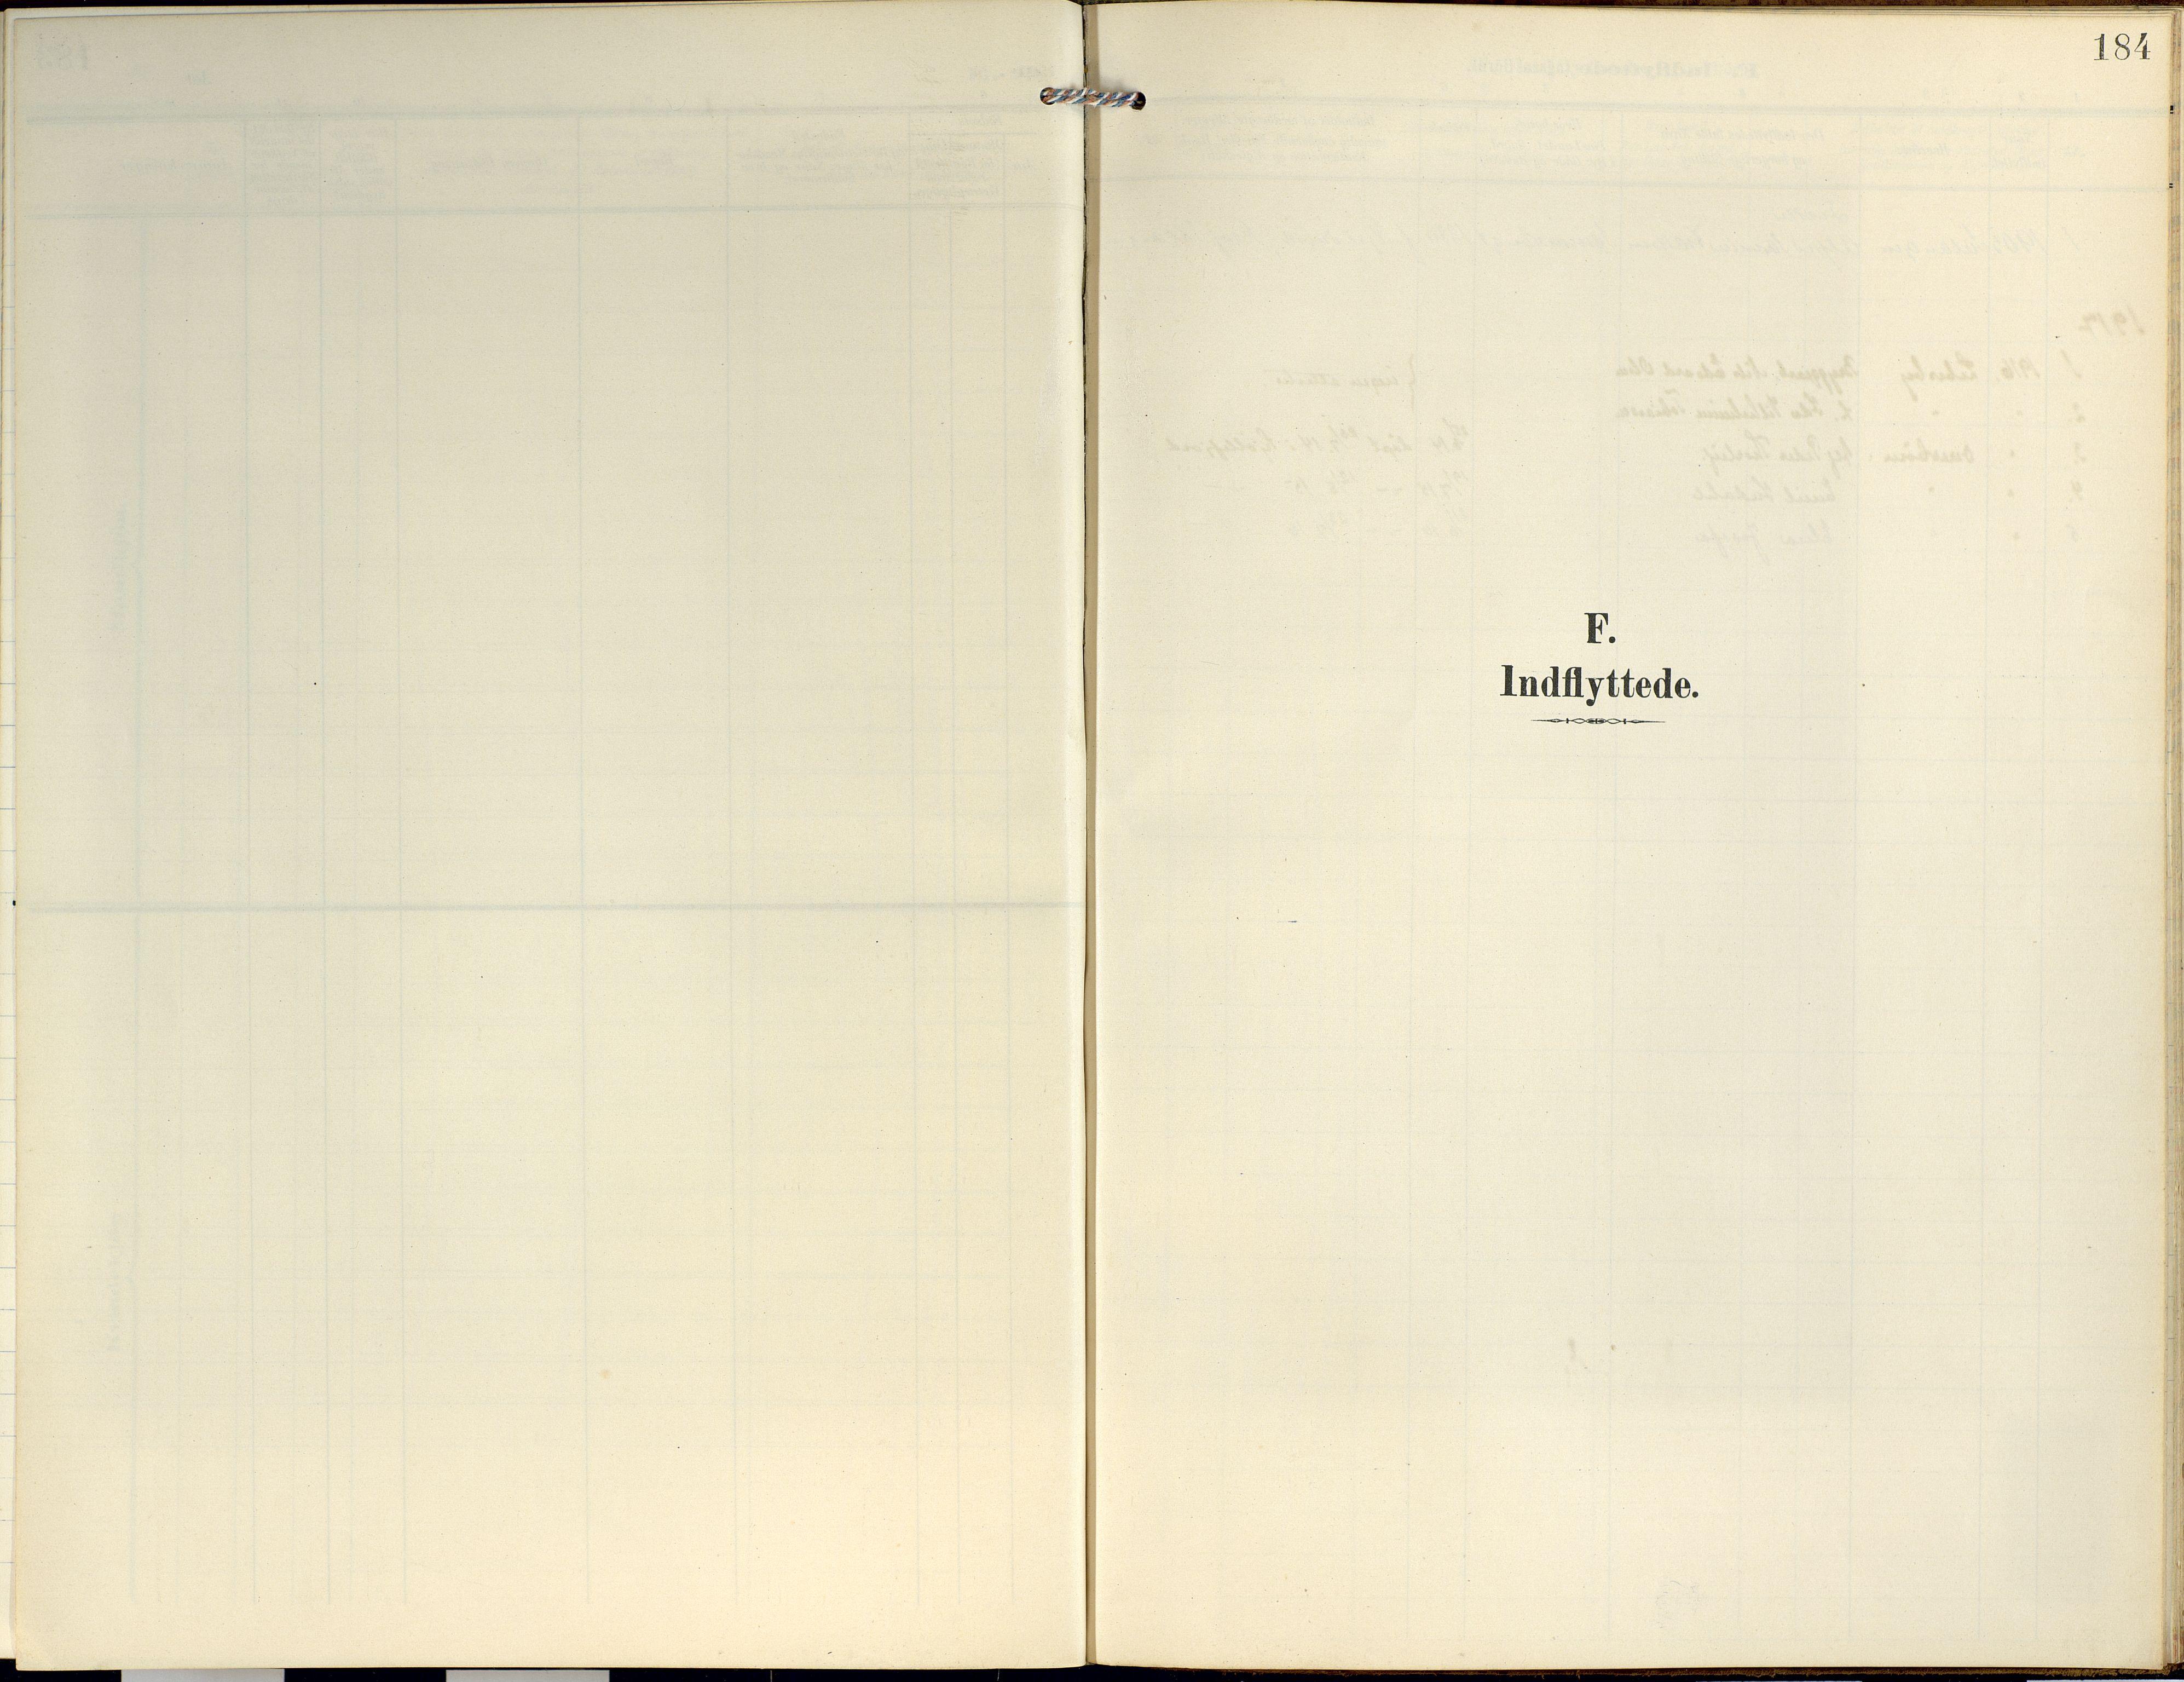 SATØ, Lyngen sokneprestembete, Ministerialbok nr. 14, 1905-1920, s. 184